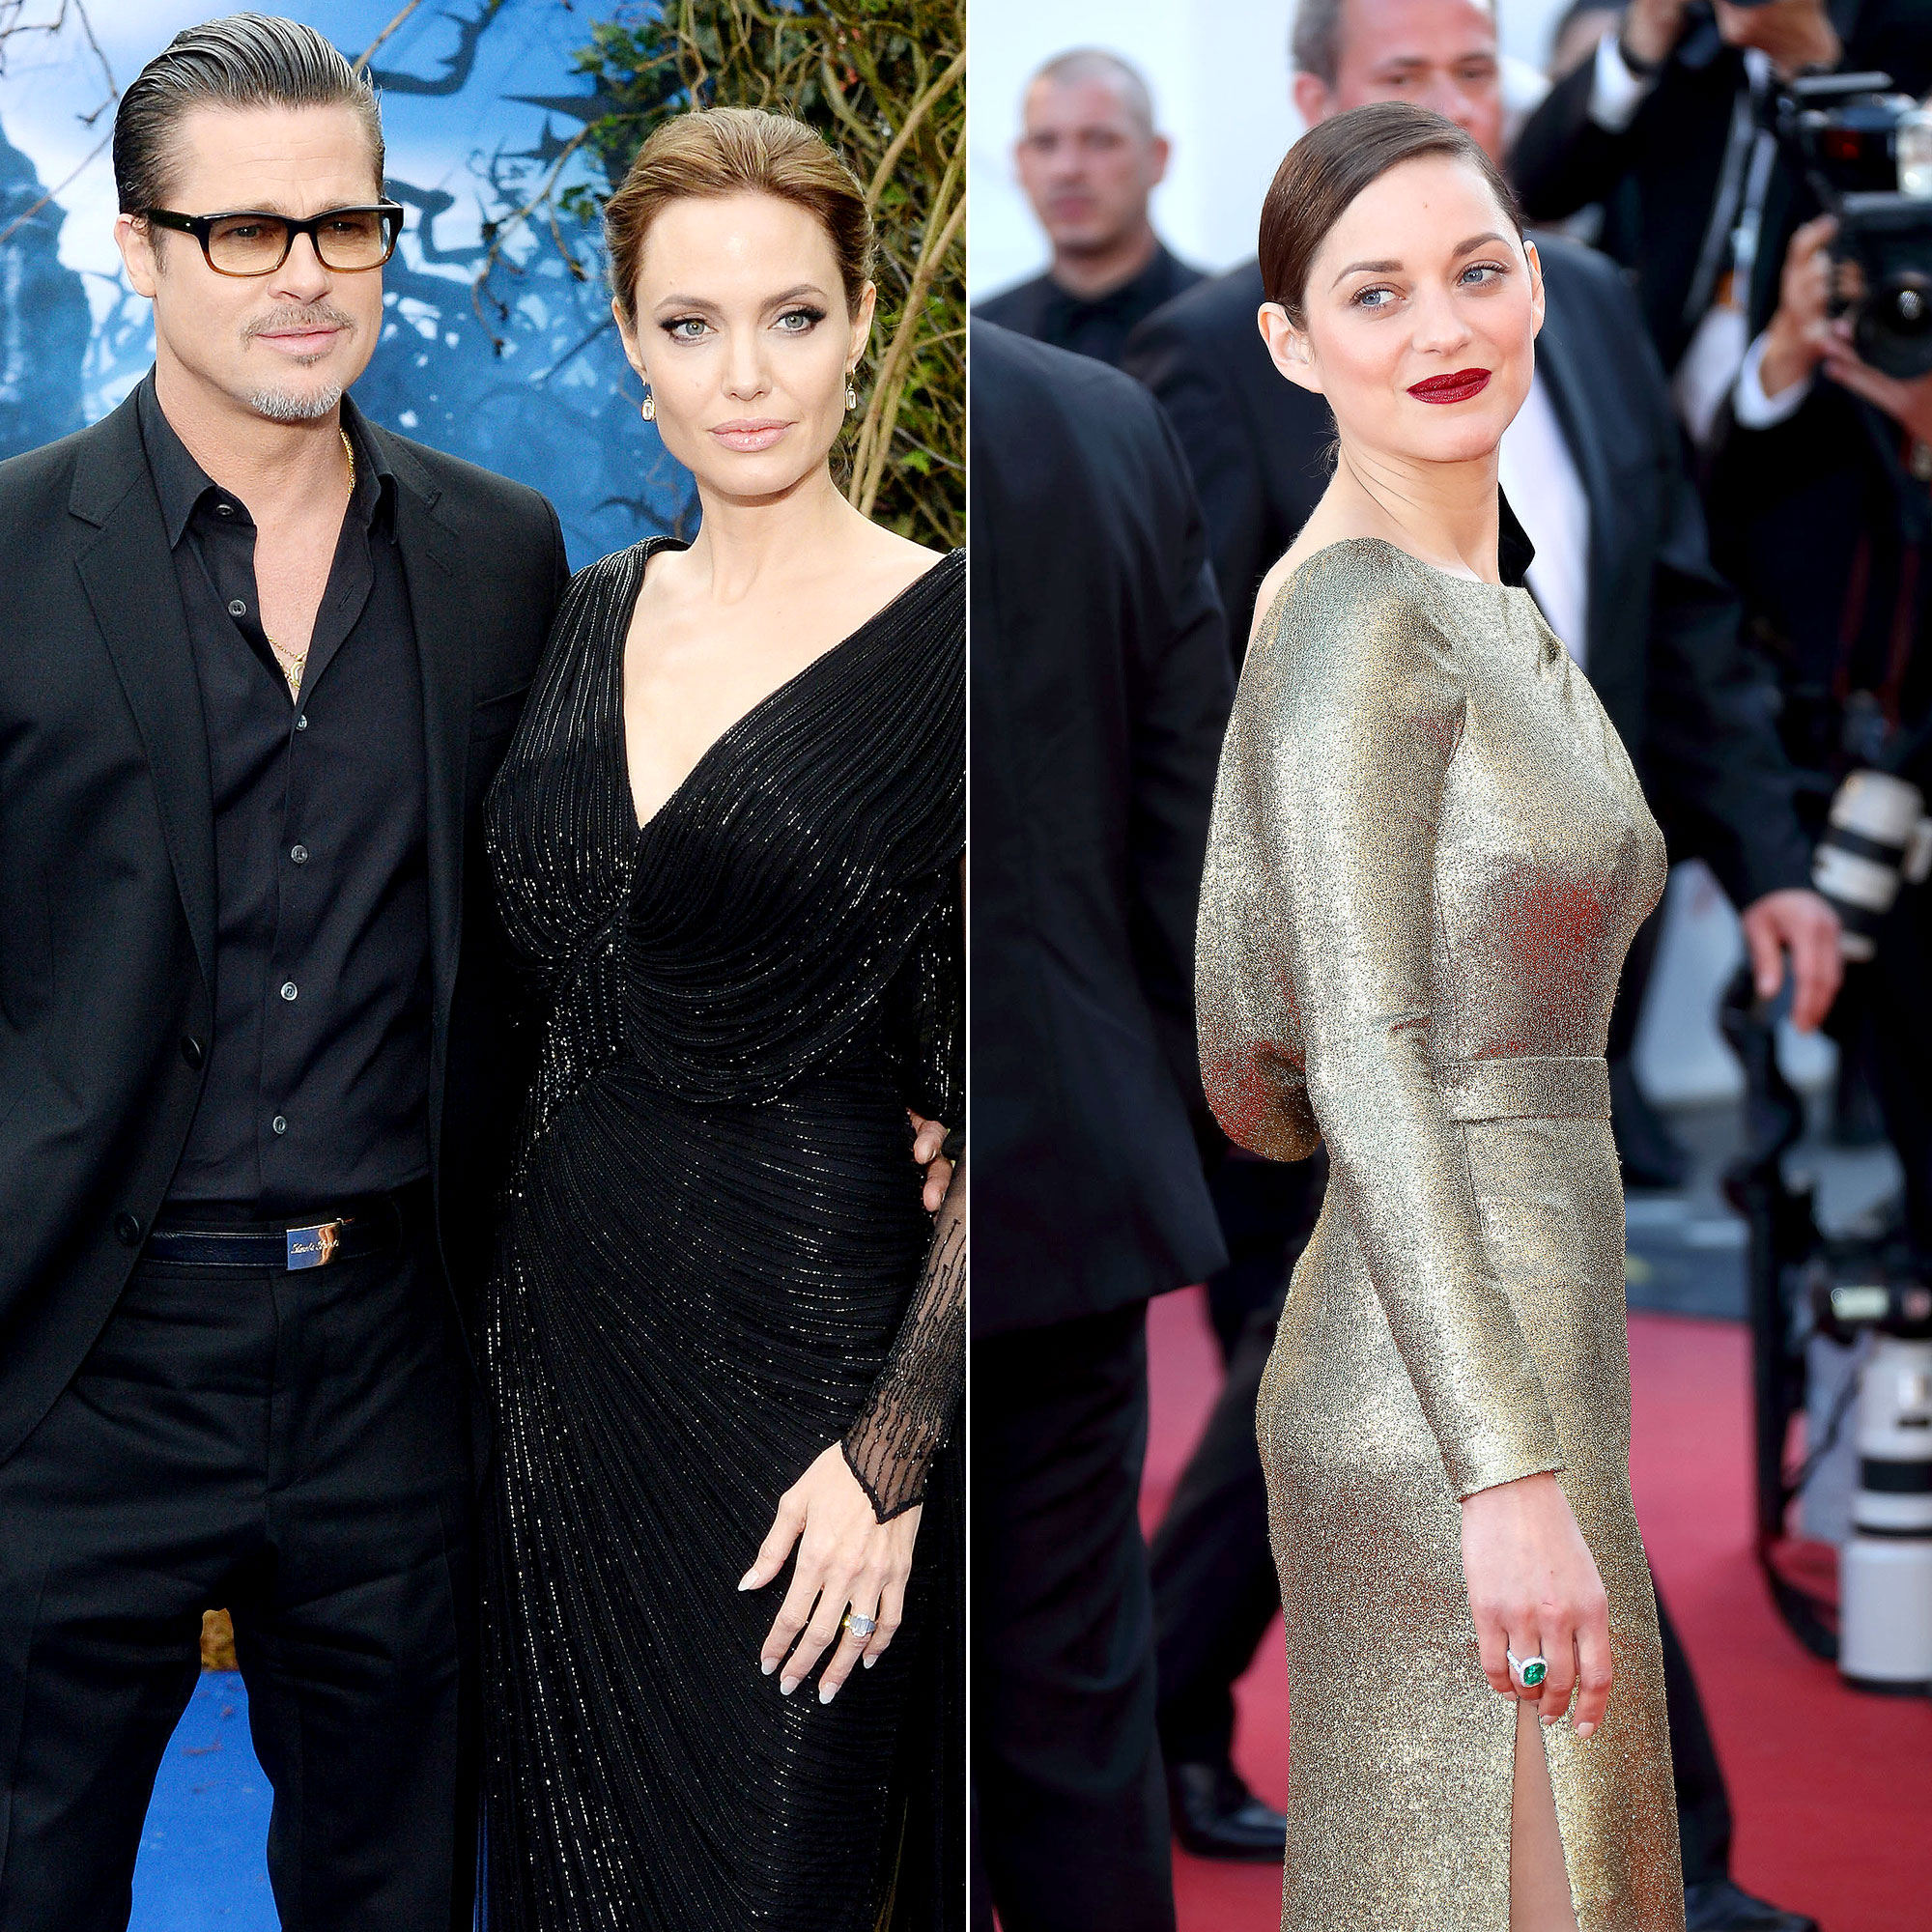 Angelina Jolie Brad Pitt Split Did Marion Cotillard Play A Role